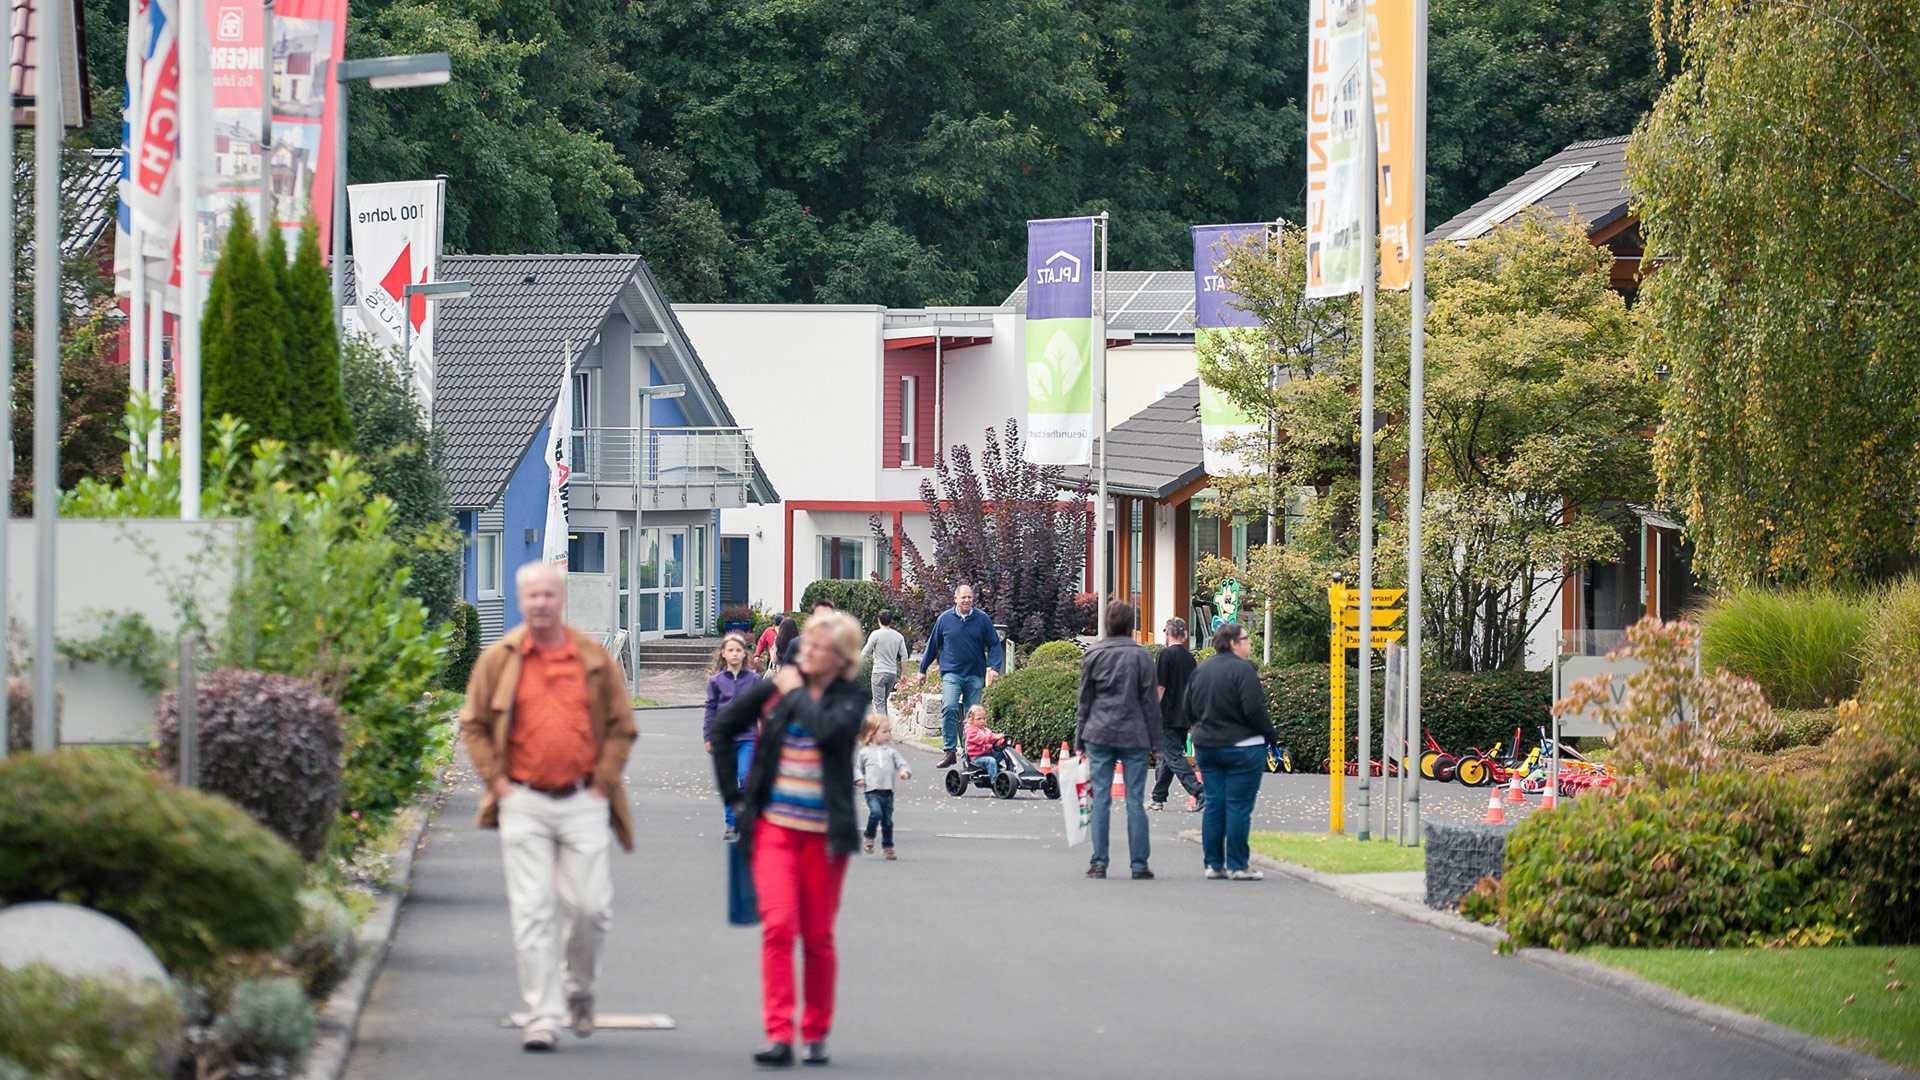 Musterhausausstellung In Bad Vilbel